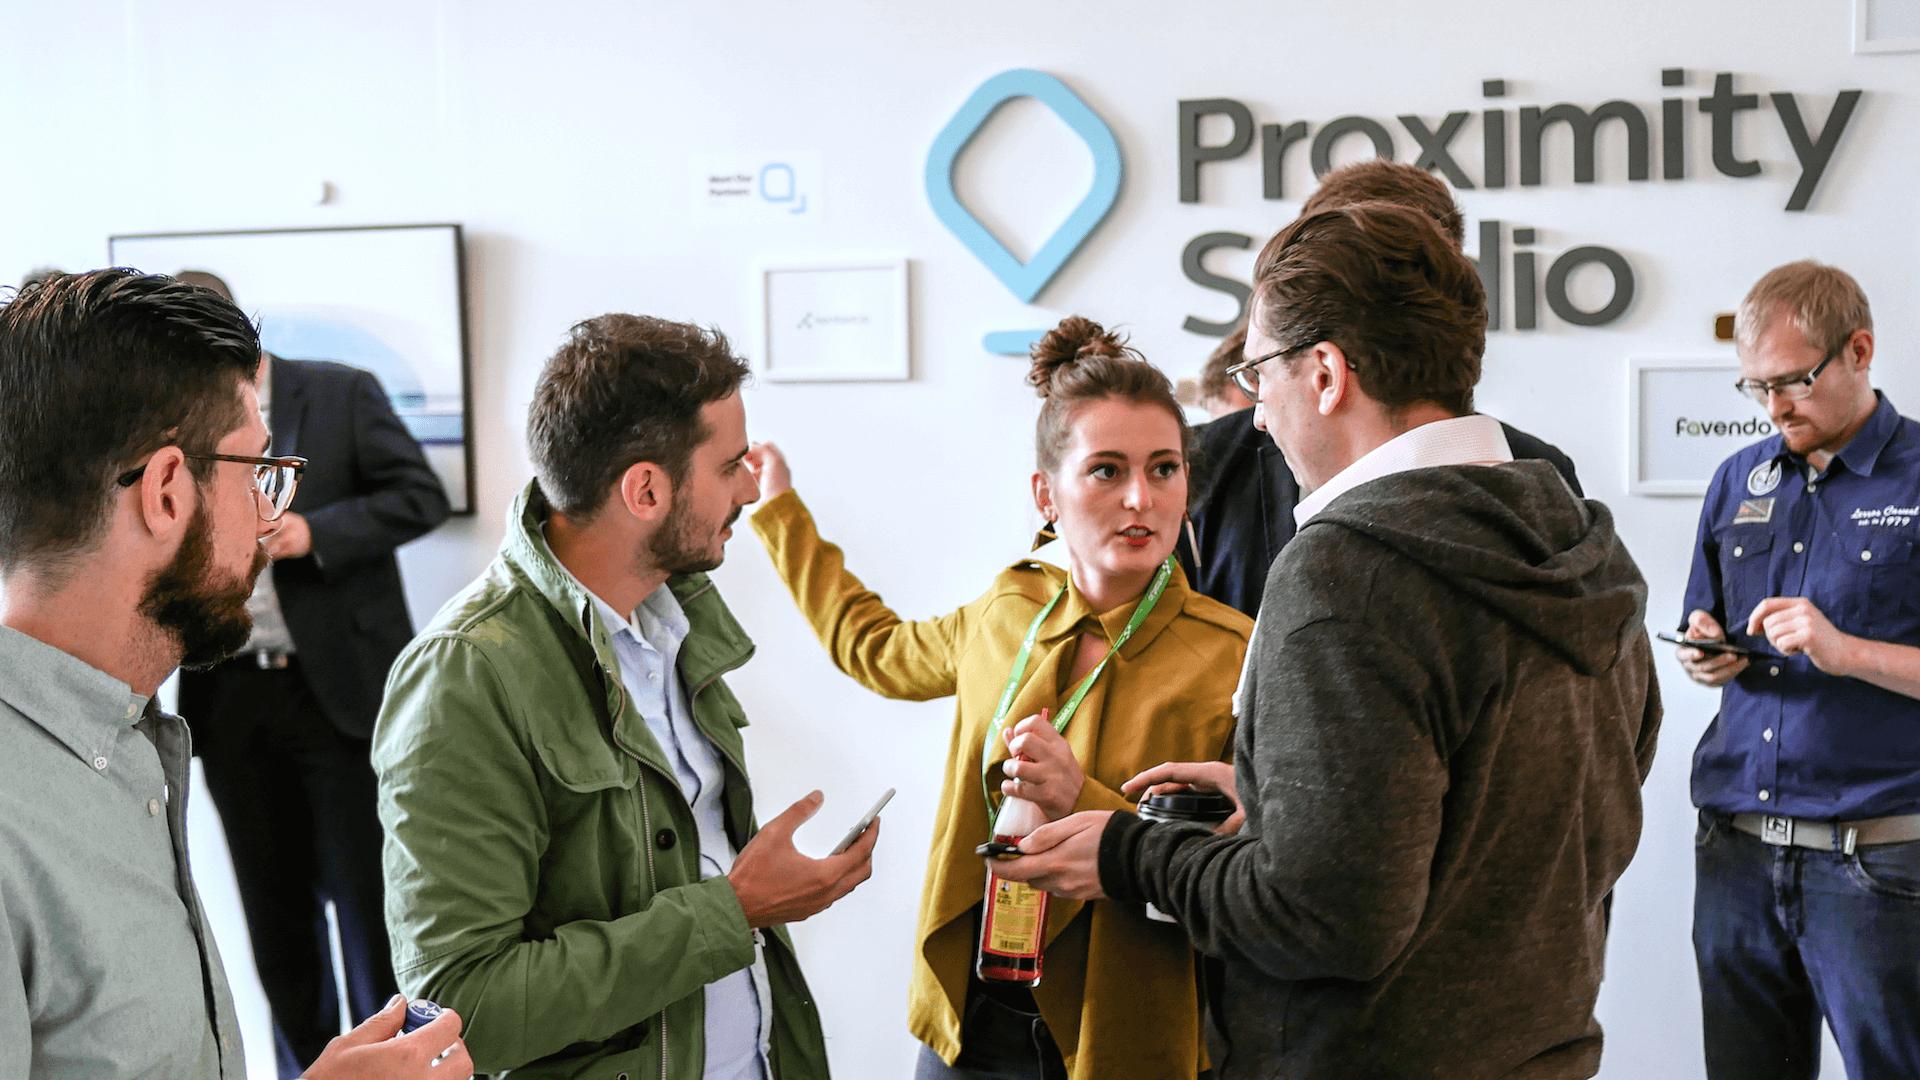 An opening event at Kontakt.io's Proximity Studio